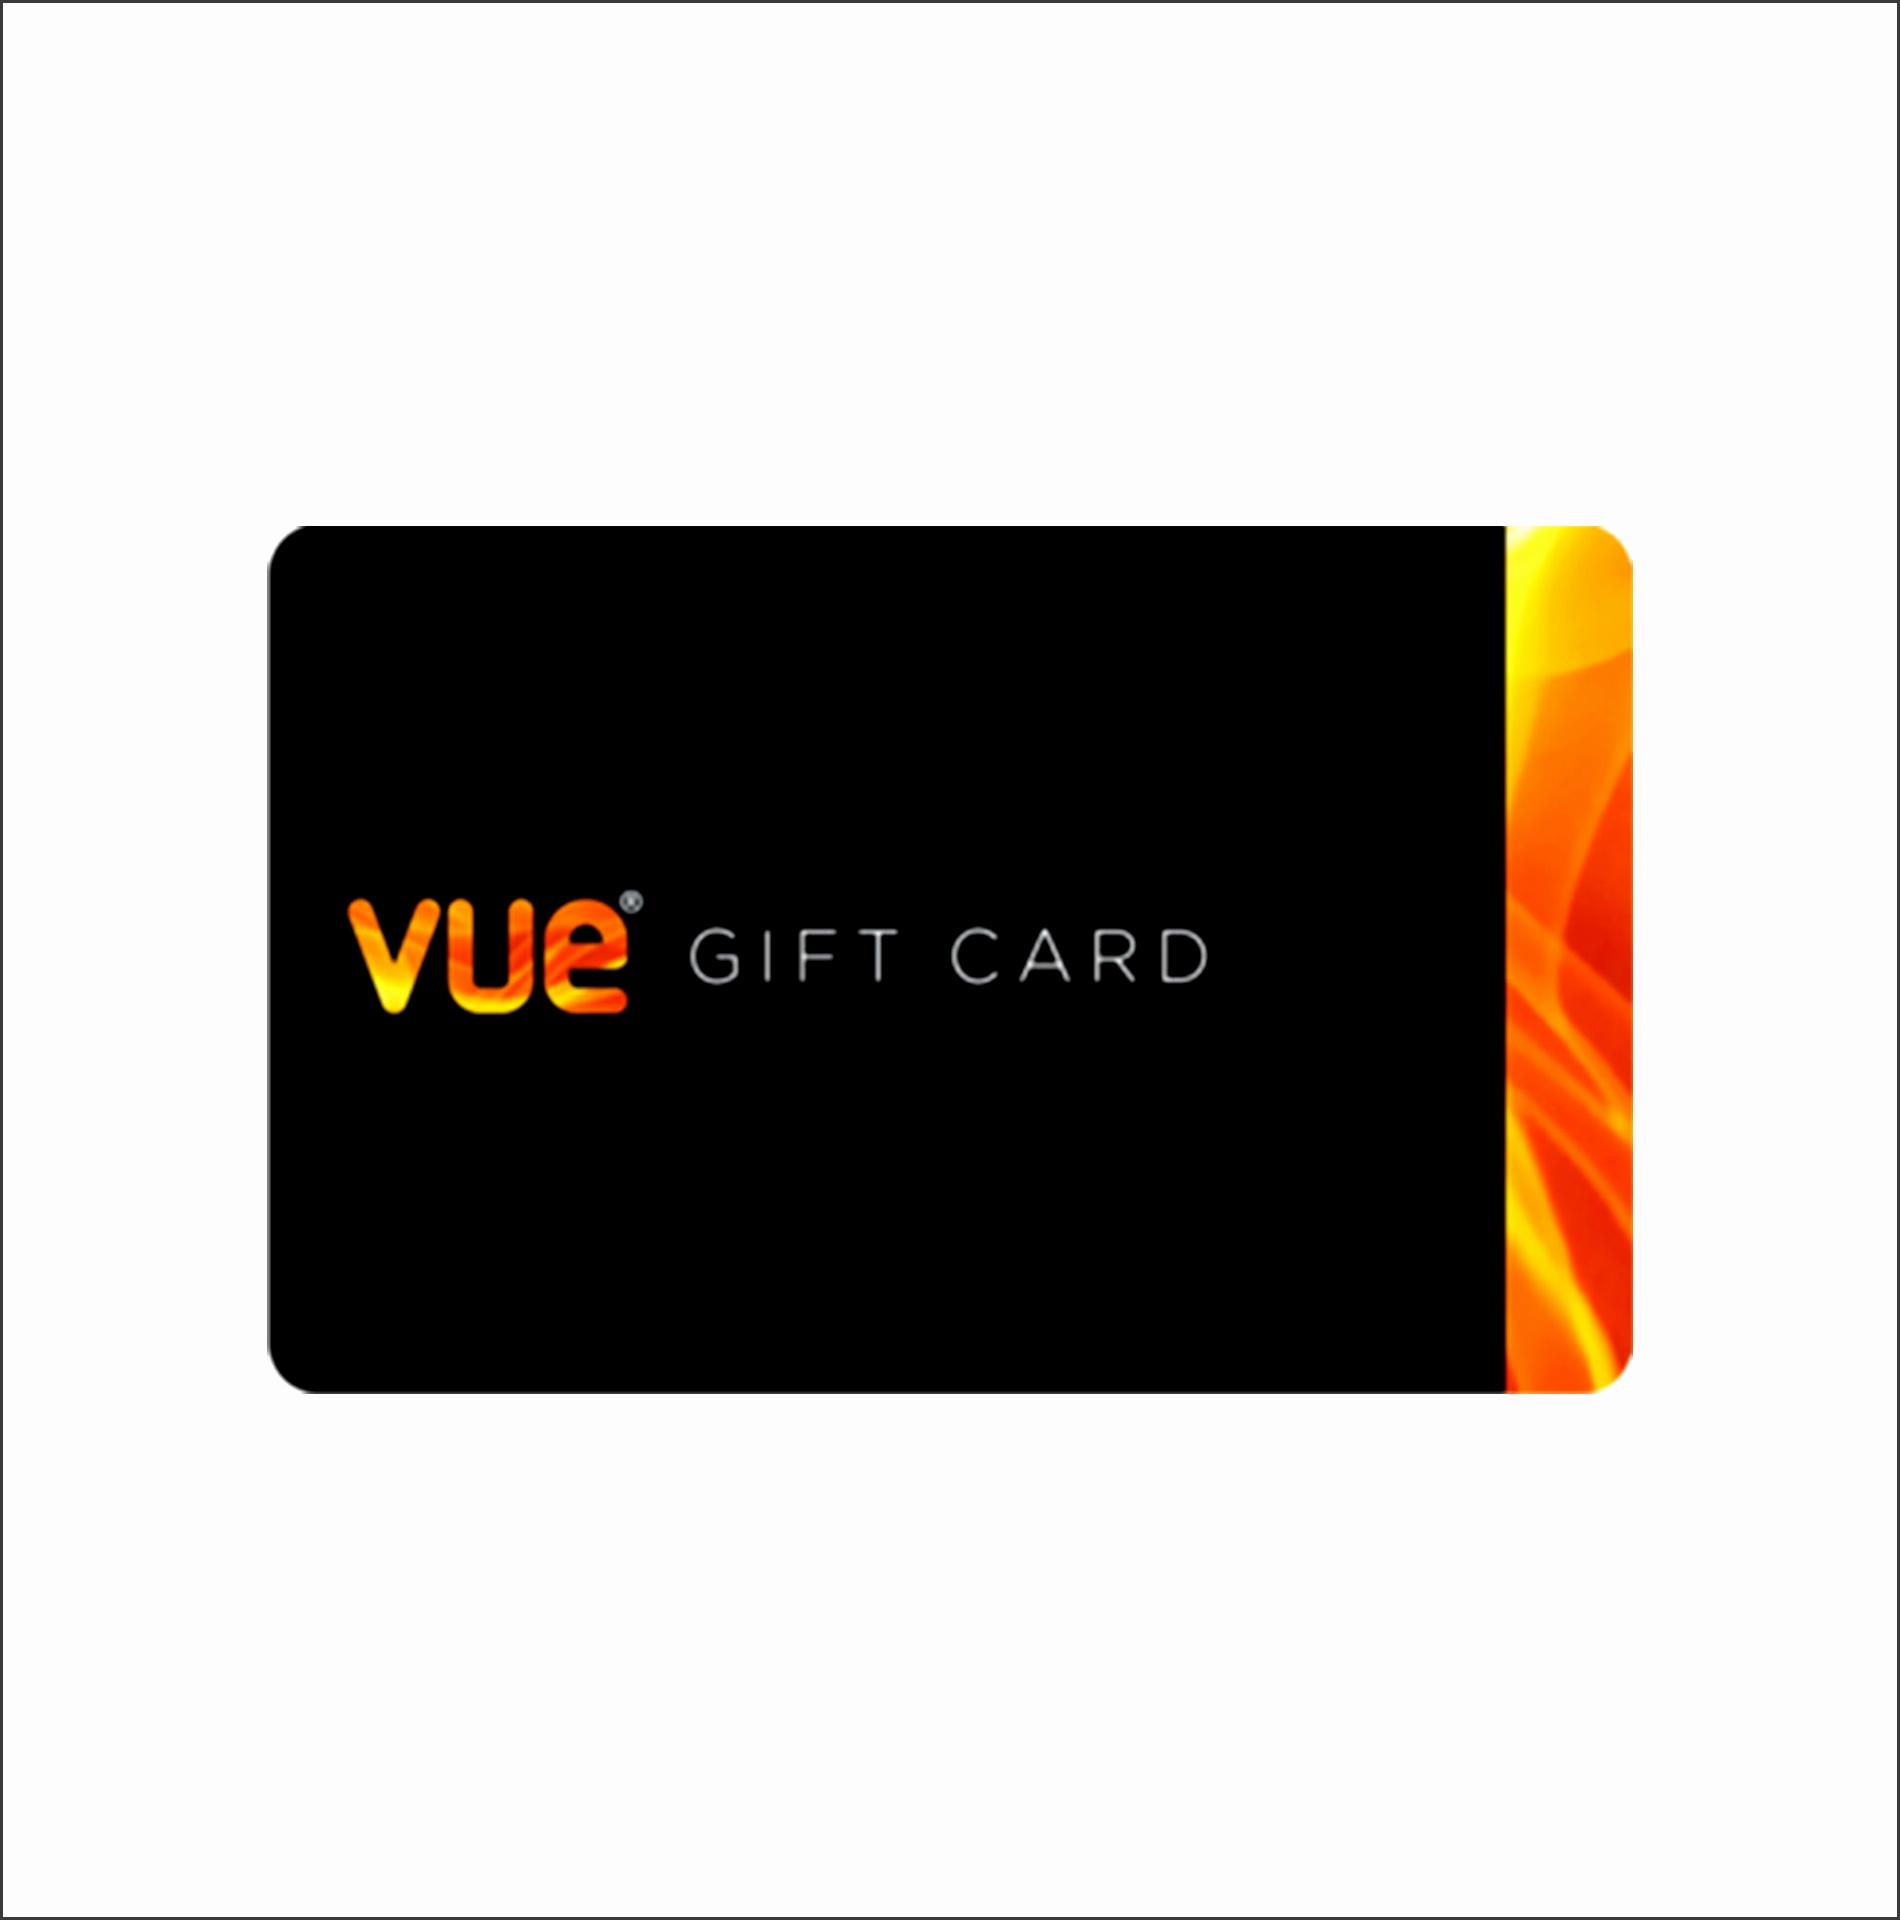 Win a VUE t card